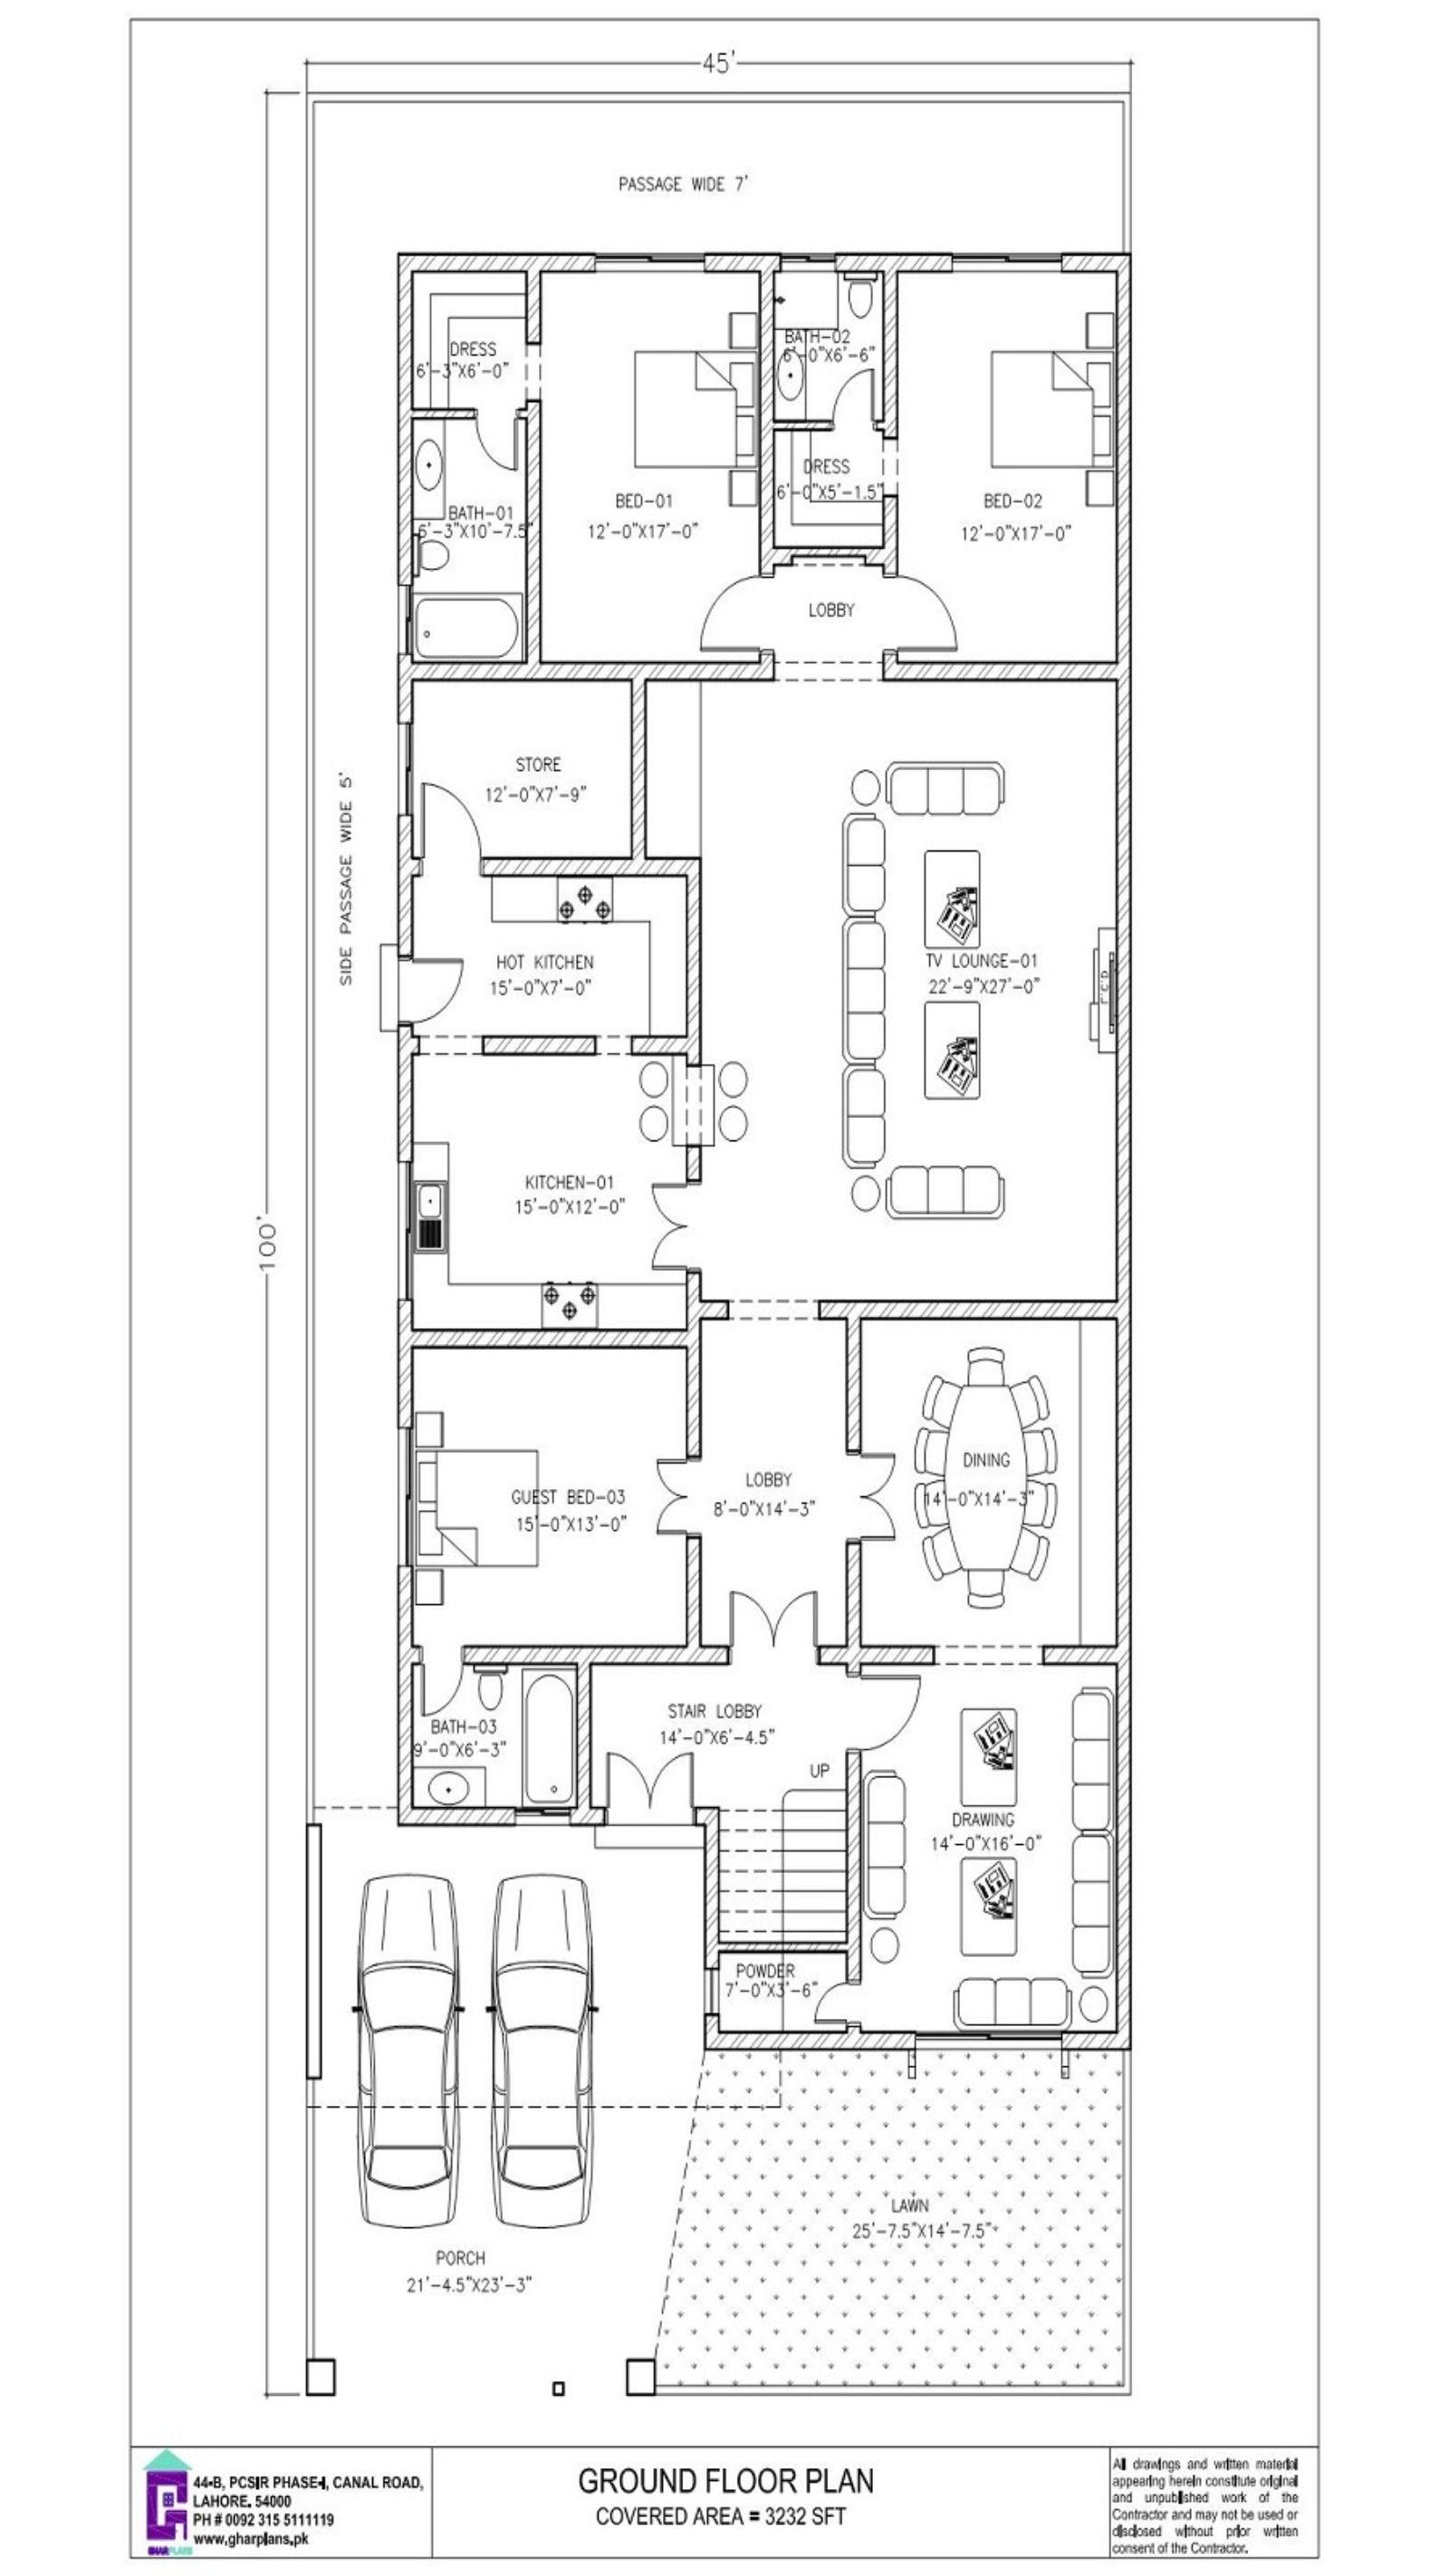 45 X 100 House Design Ground Floor Plan 4500 Square Feet Kitchen Design Plans House Design Free House Design